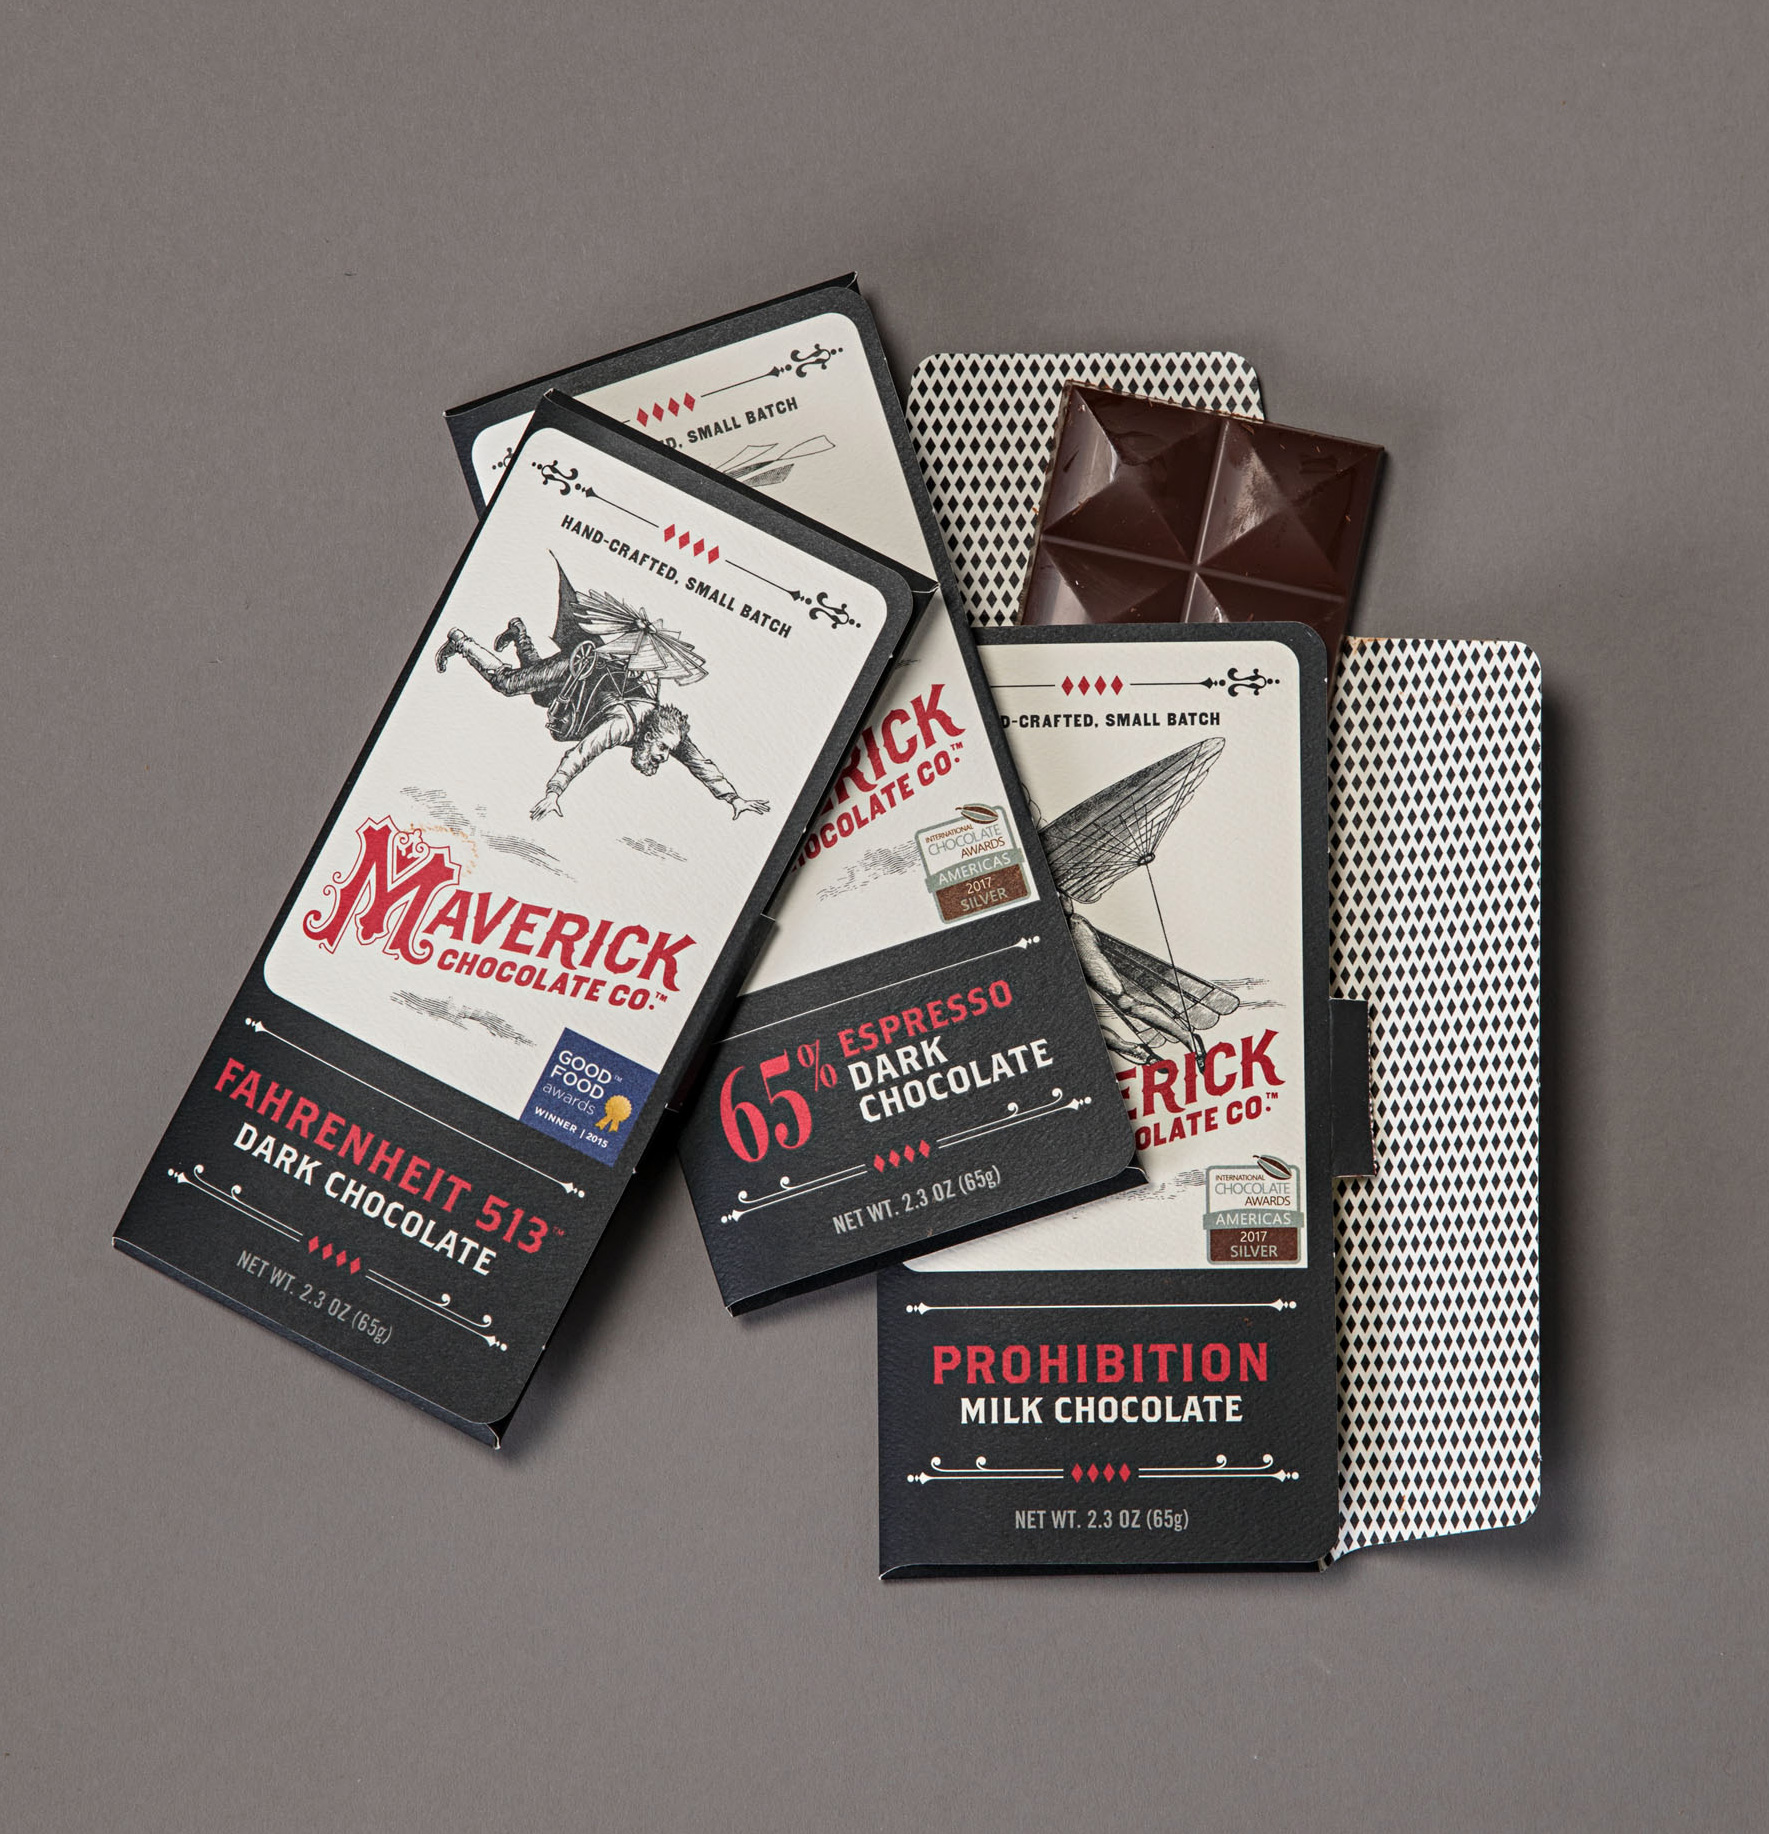 Maverick chocolate